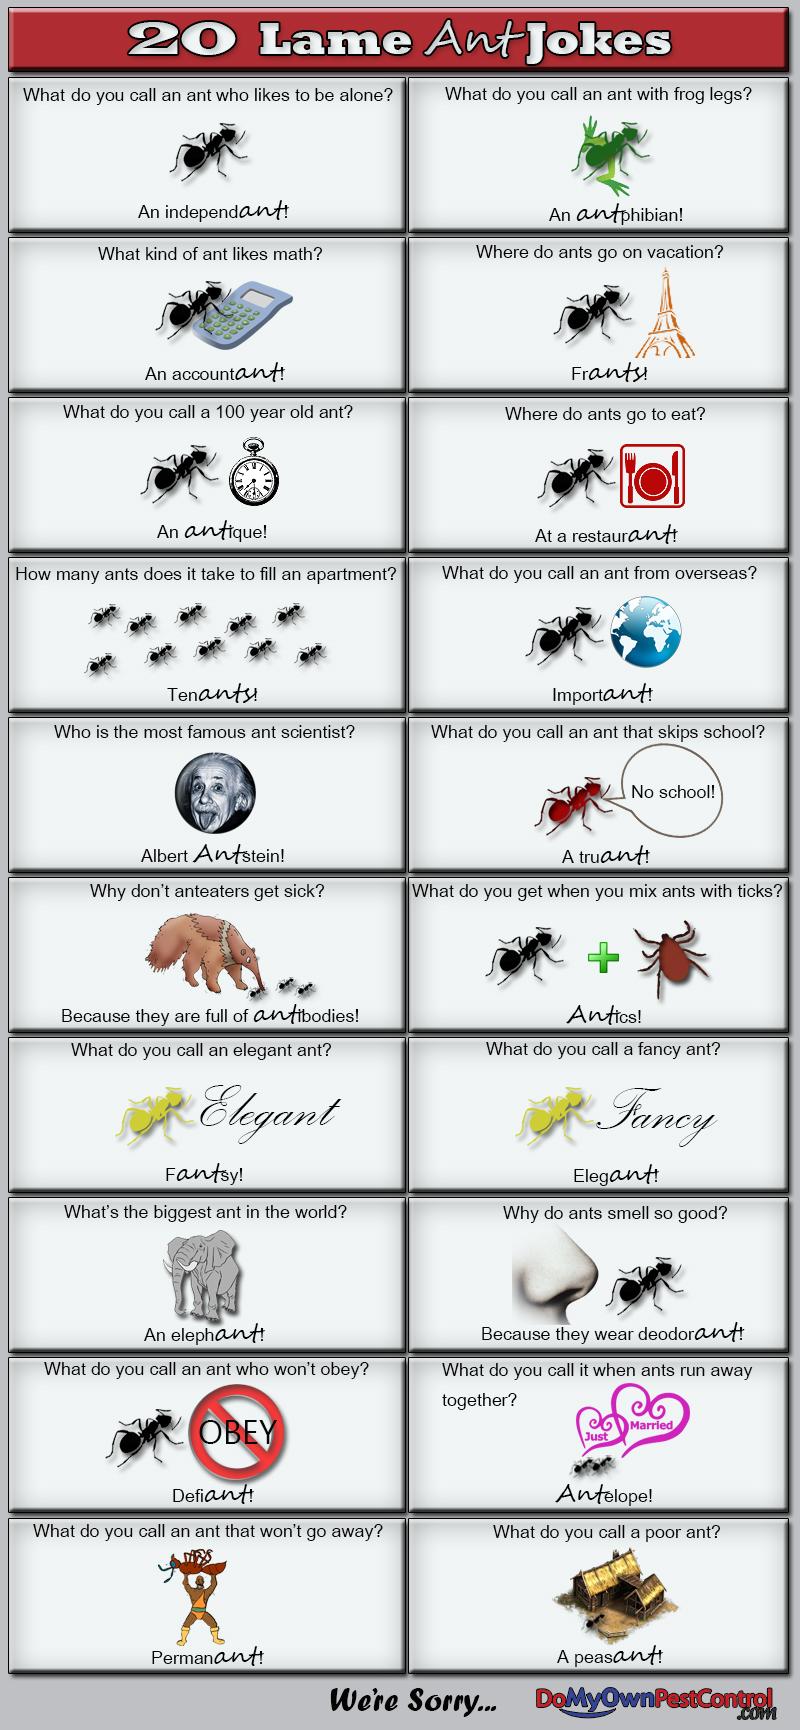 Ant Jokes & Ant Puns | DoMyOwn com